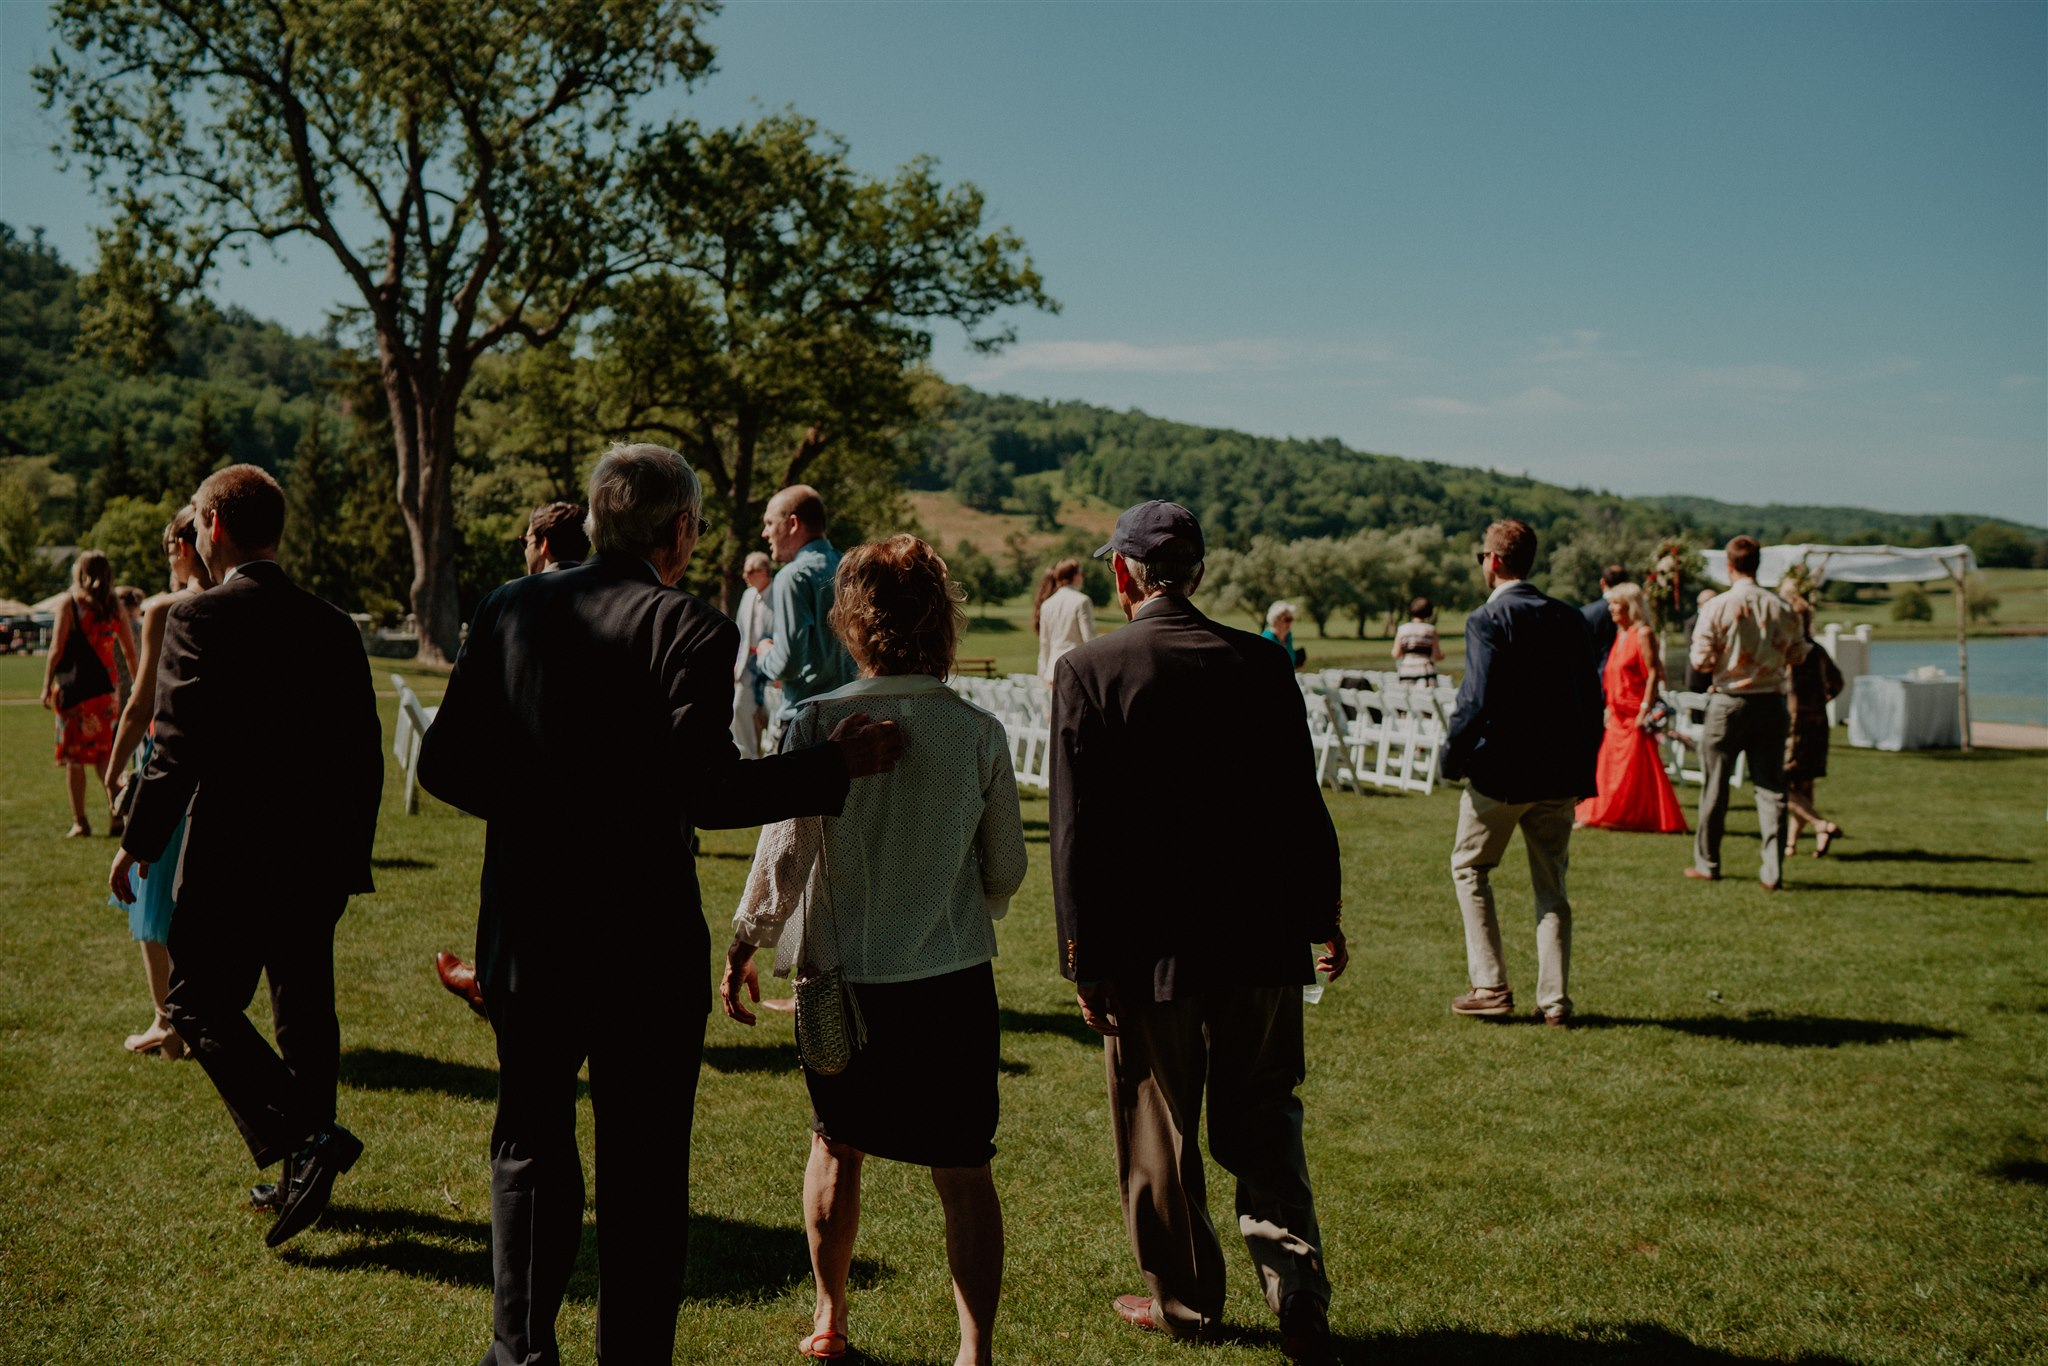 Chellise_Michael_Photography_Hudson_Valley_Wedding_Photographer_Otesaga_Hotel-3021.jpg